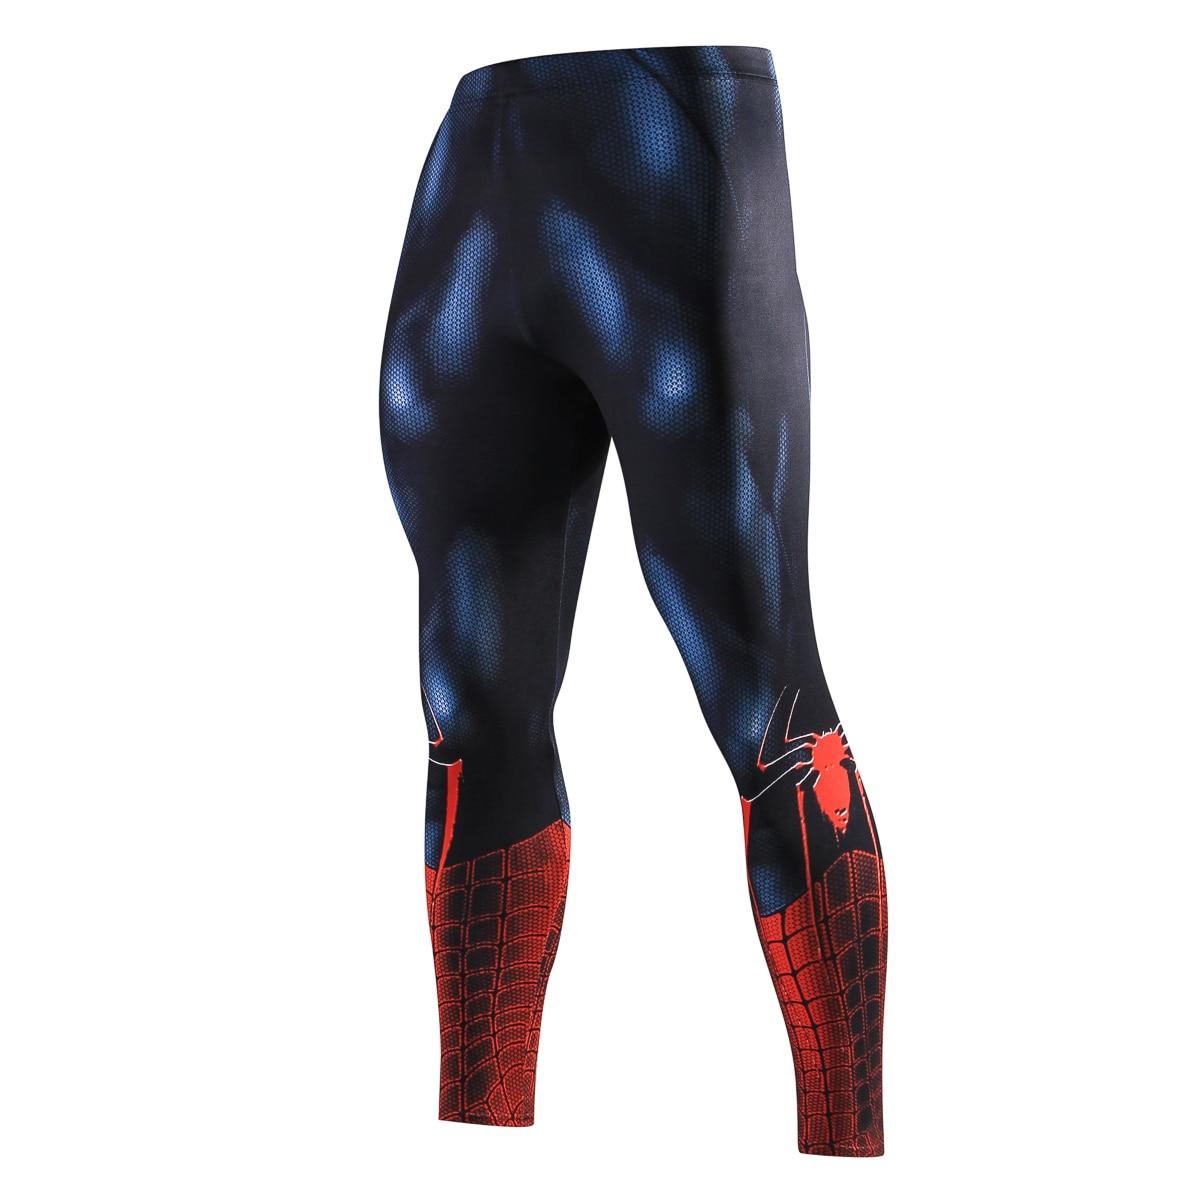 Men Skinny Compression Pants Superman Spiderman Iron Man Batman Leggings Sweatpants 3D Fitness Bodybuilding Elastic Trousers replay ty101 7x17 5x114 3 d60 1 et39 s